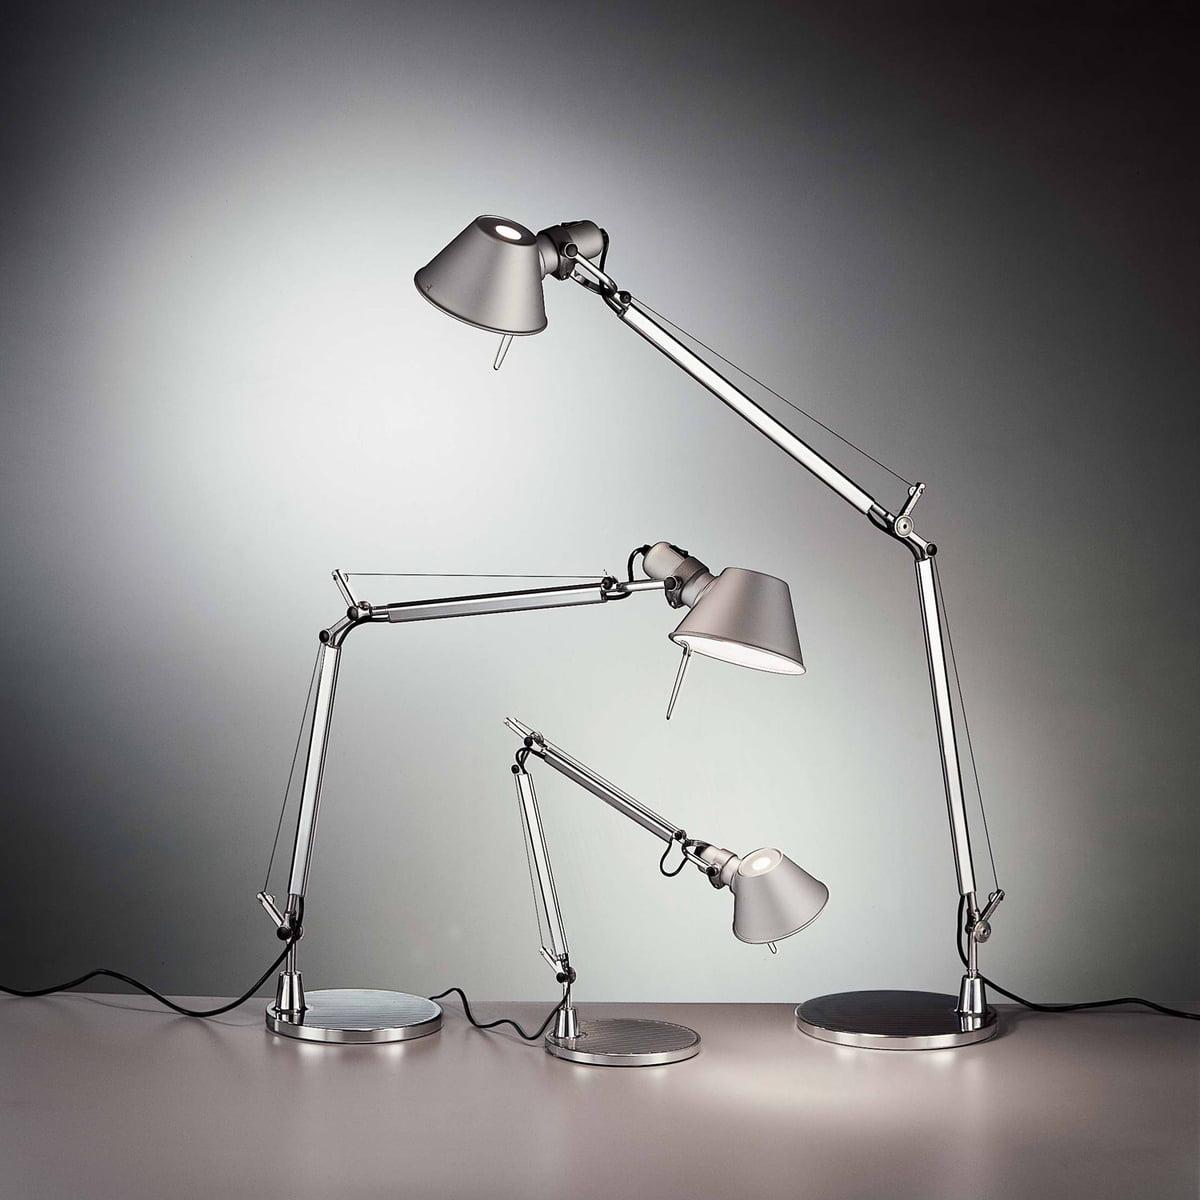 tolomeo mini table lamp by artemide - artemide  tolomeo mini table lamp